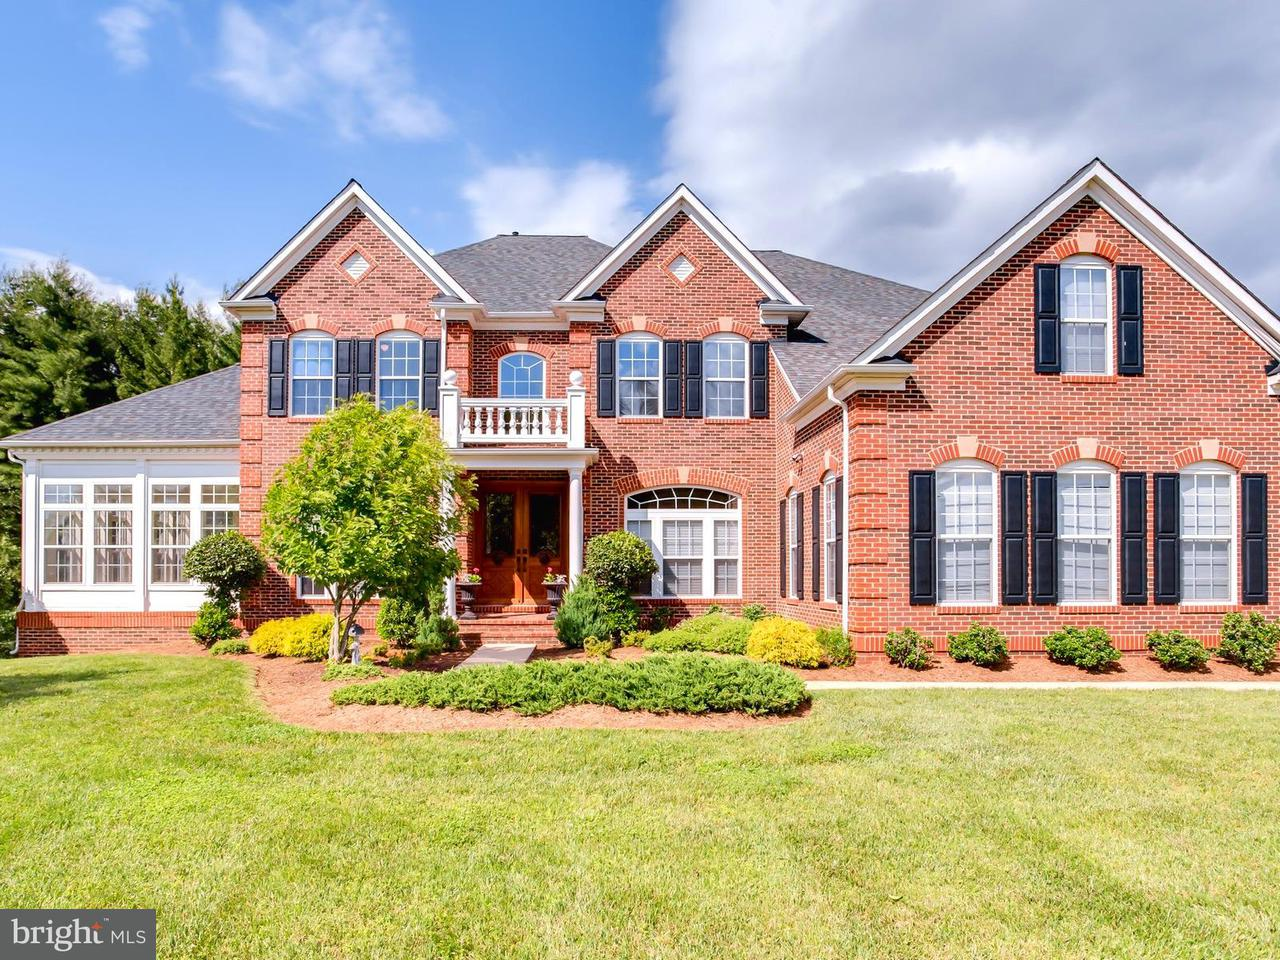 Single Family Home for Sale at 12805 PILOTS LANDING WAY 12805 PILOTS LANDING WAY Darnestown, Maryland 20878 United States